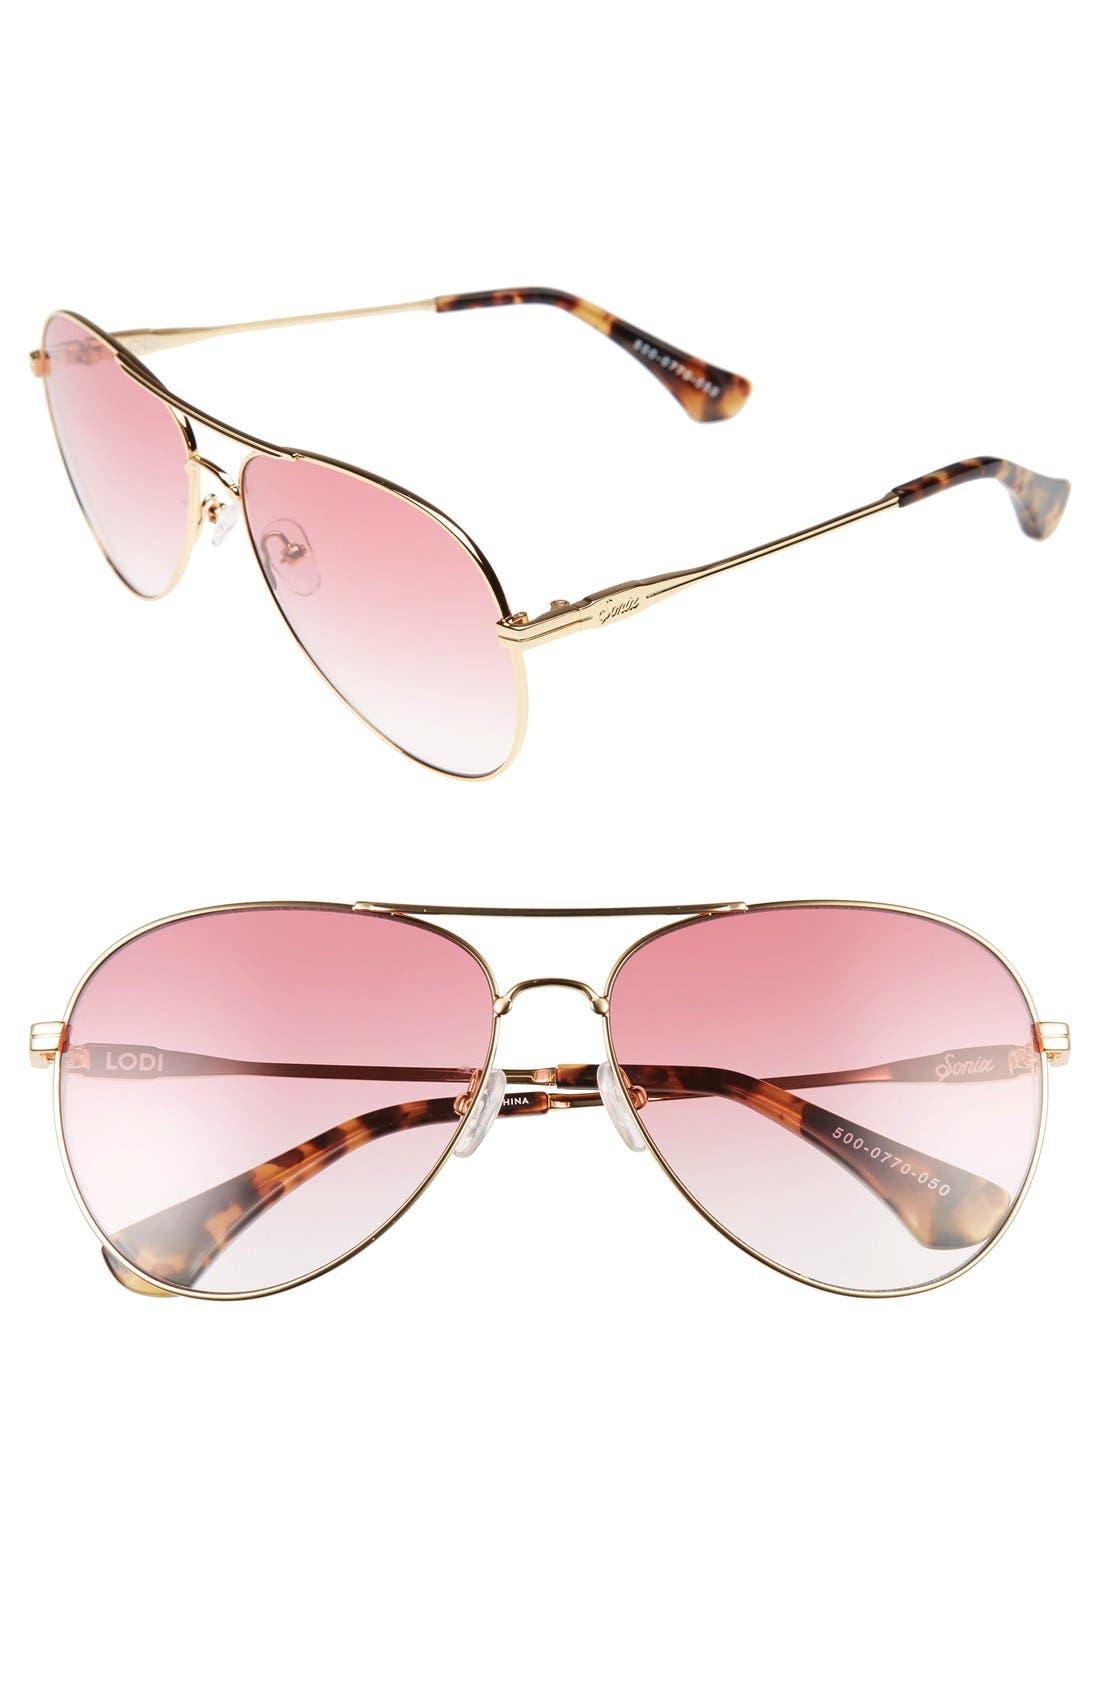 Lodi 62mm Mirrored Aviator Sunglasses,                             Main thumbnail 2, color,